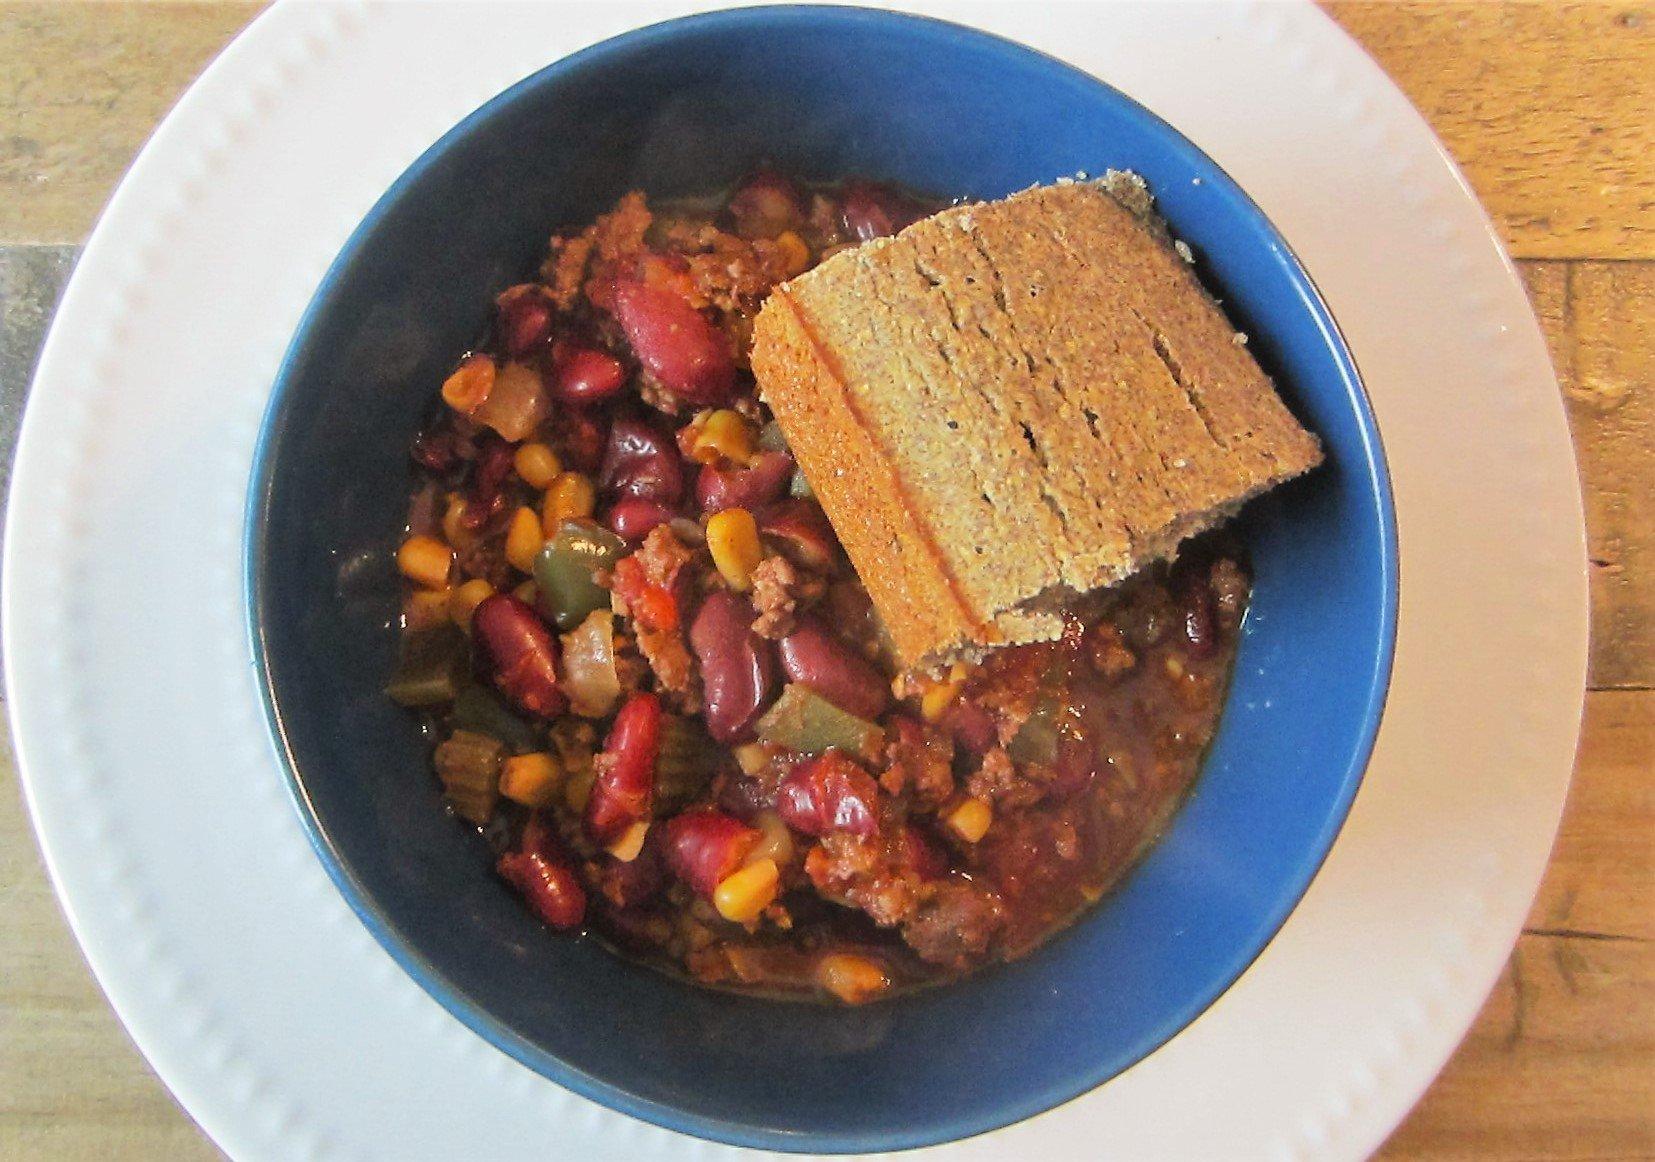 homemade slow cooker chili with buckwheat cornbread